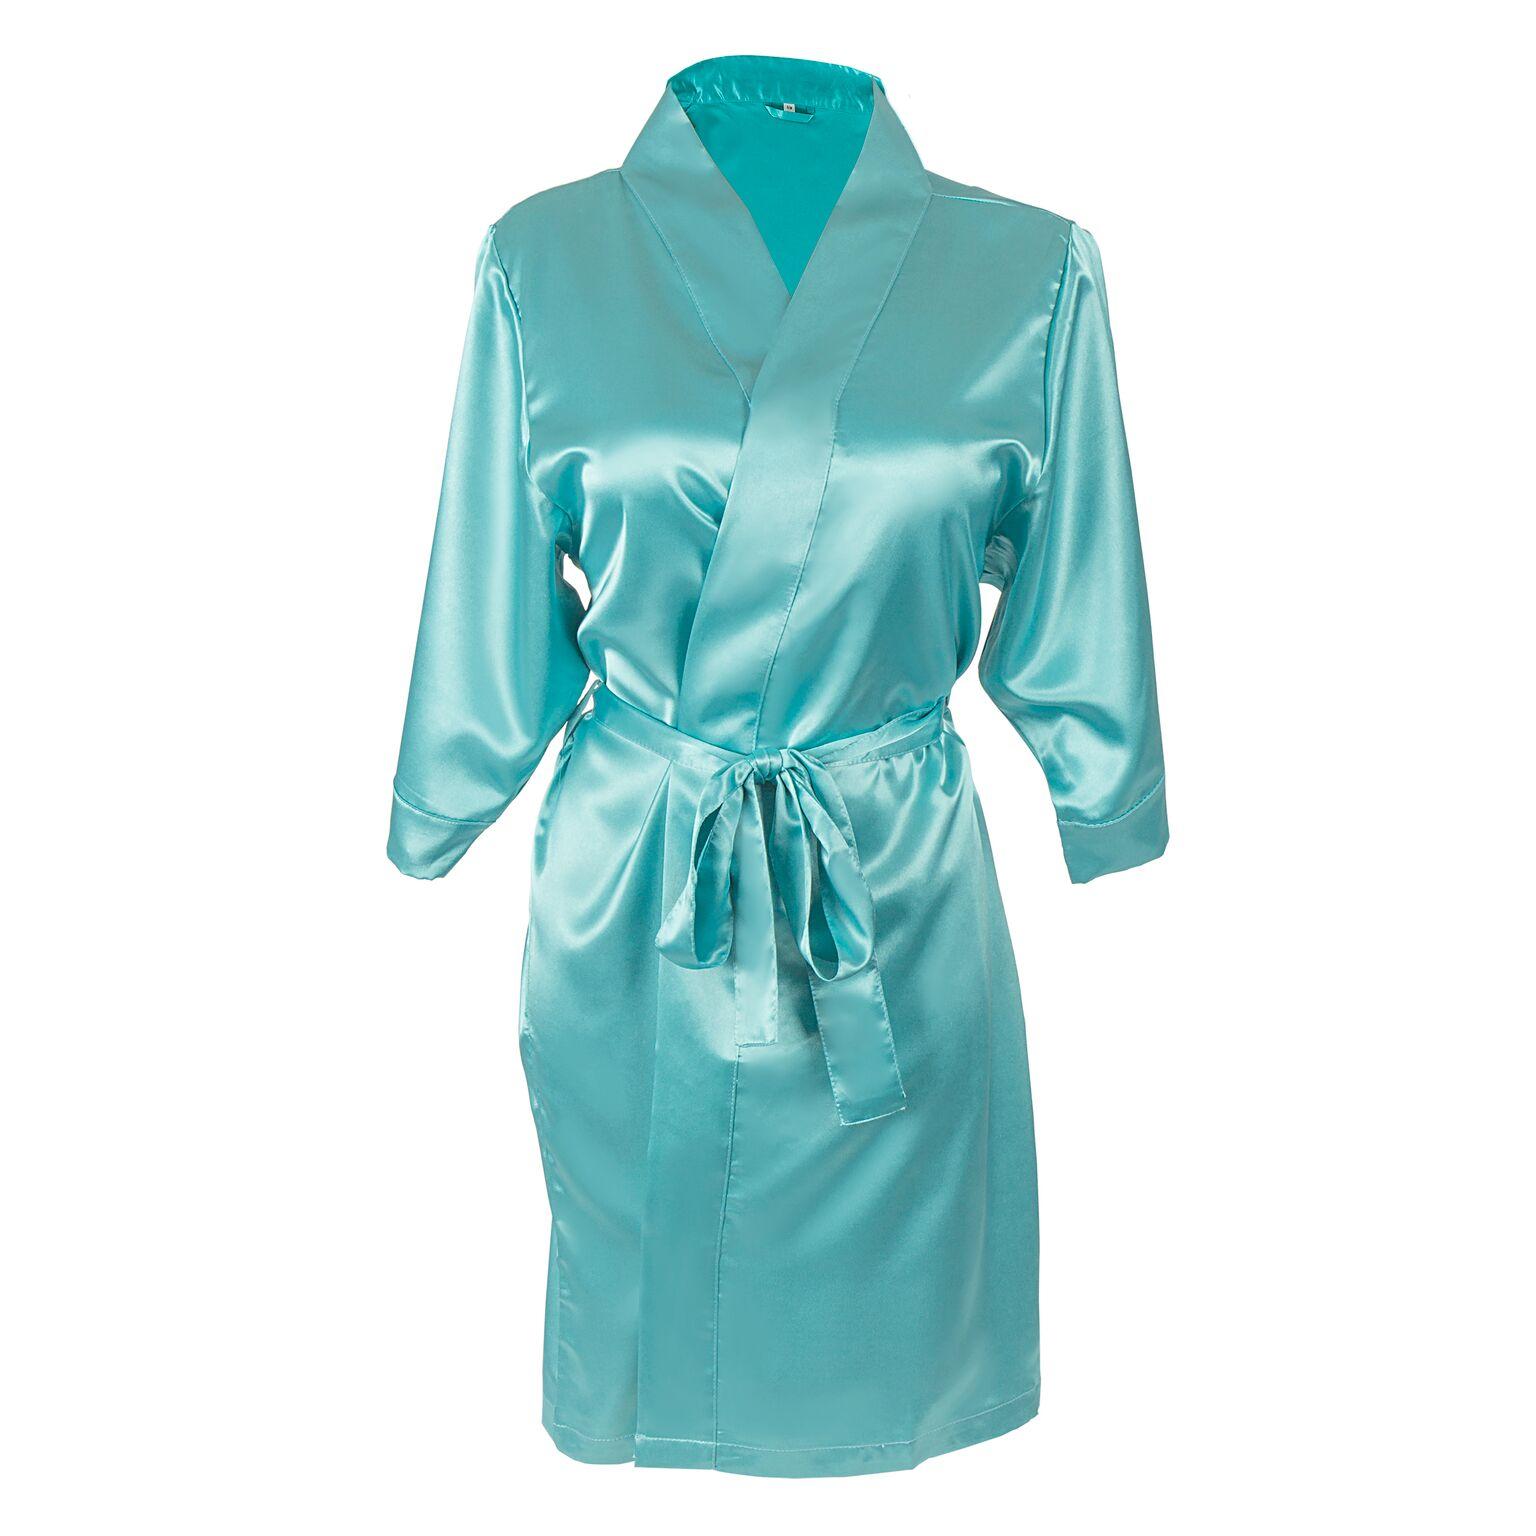 Cathys Concepts 1804A-LXL-ST Team Bride Satin Robe, Aqua - Large & Extra Large